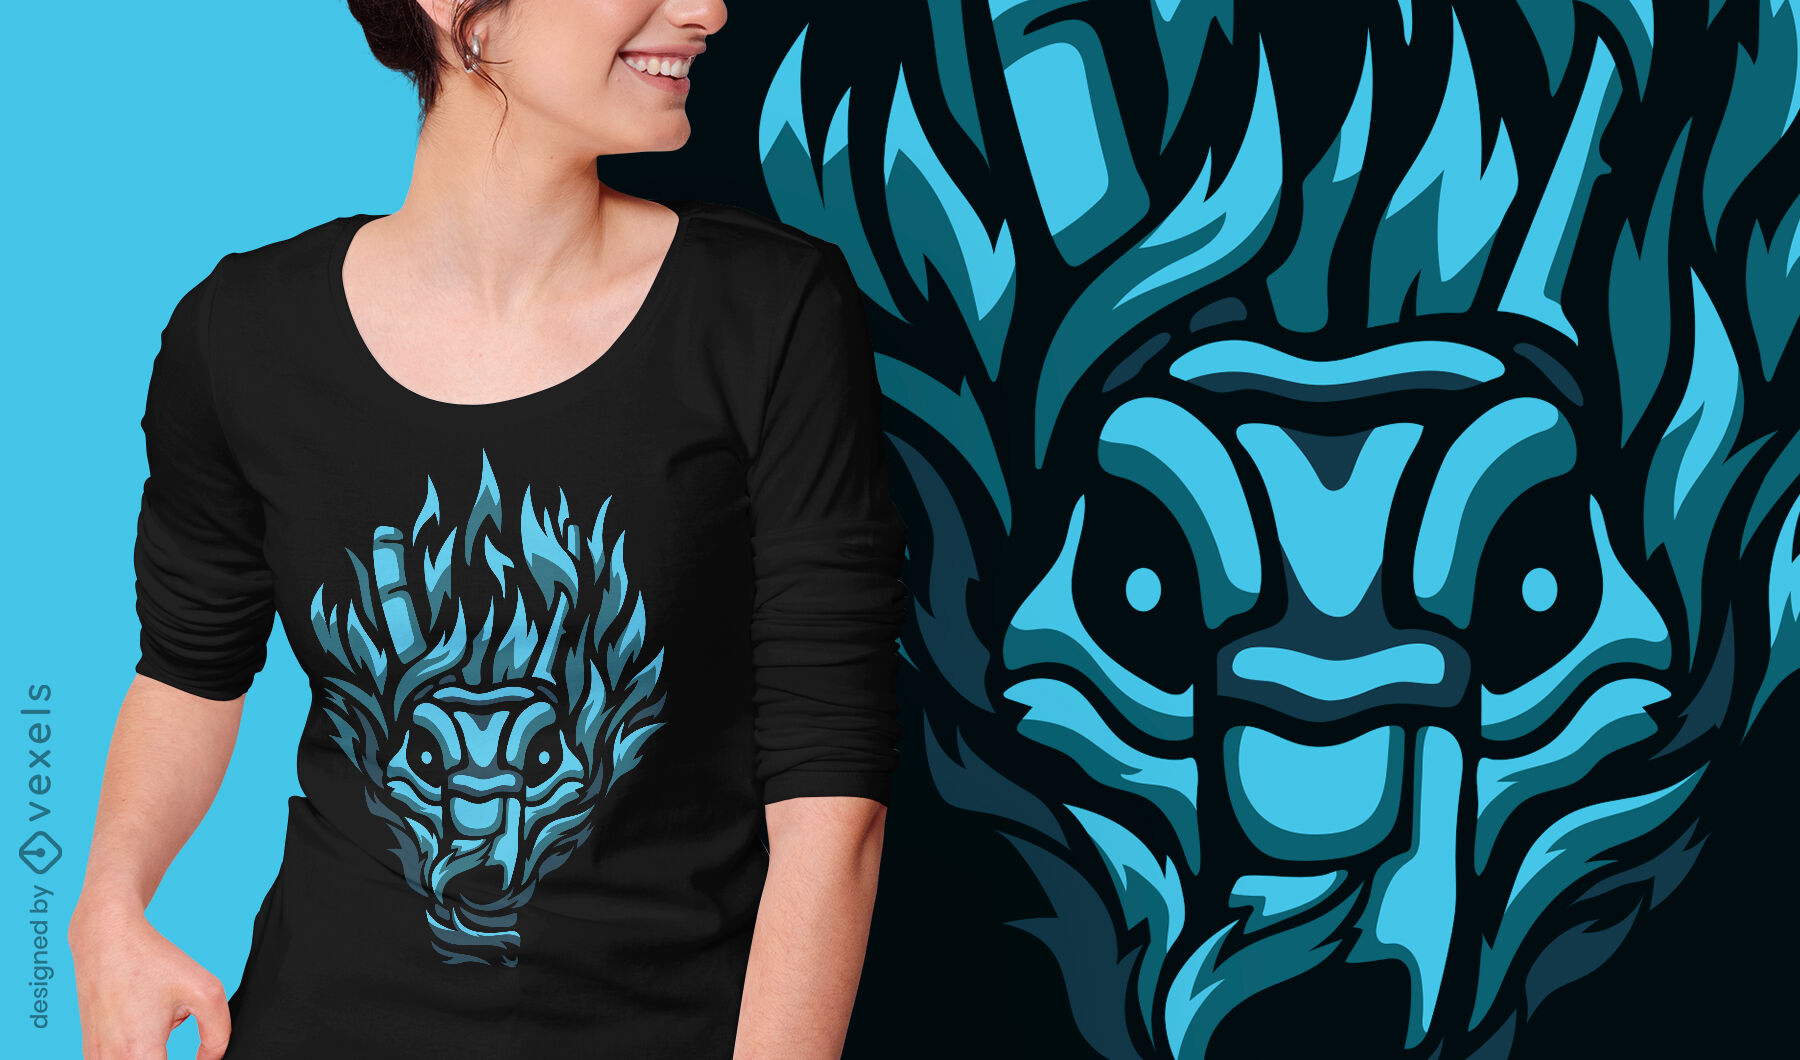 Dark creature demon face t-shirt design